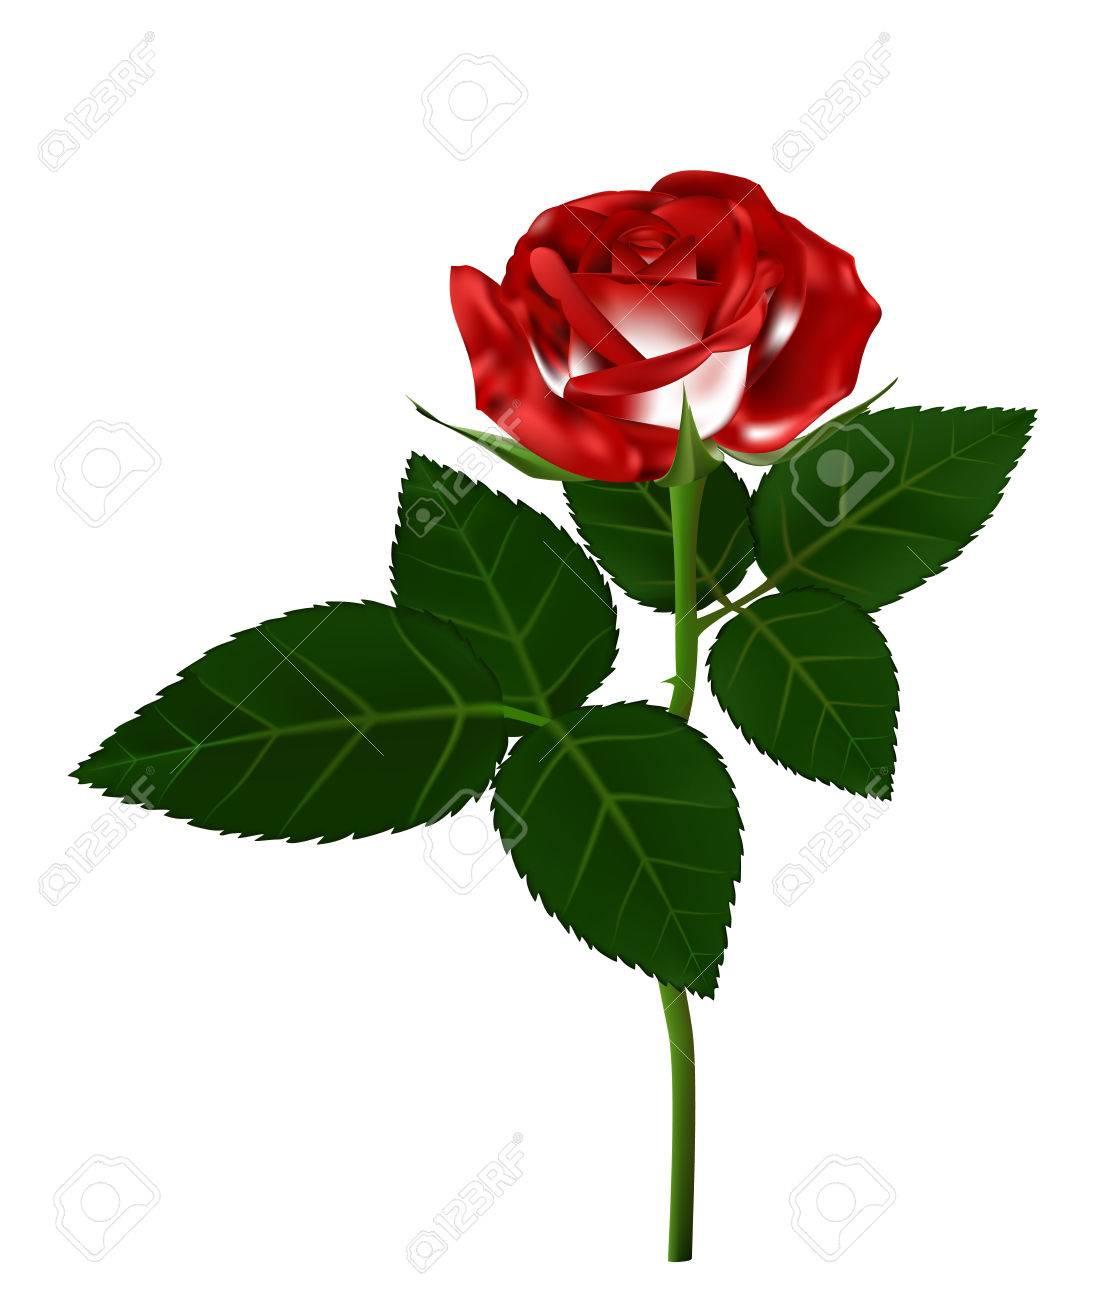 Single Red Rose Flower Illustration Beautiful On Long Stem Isolated White Background